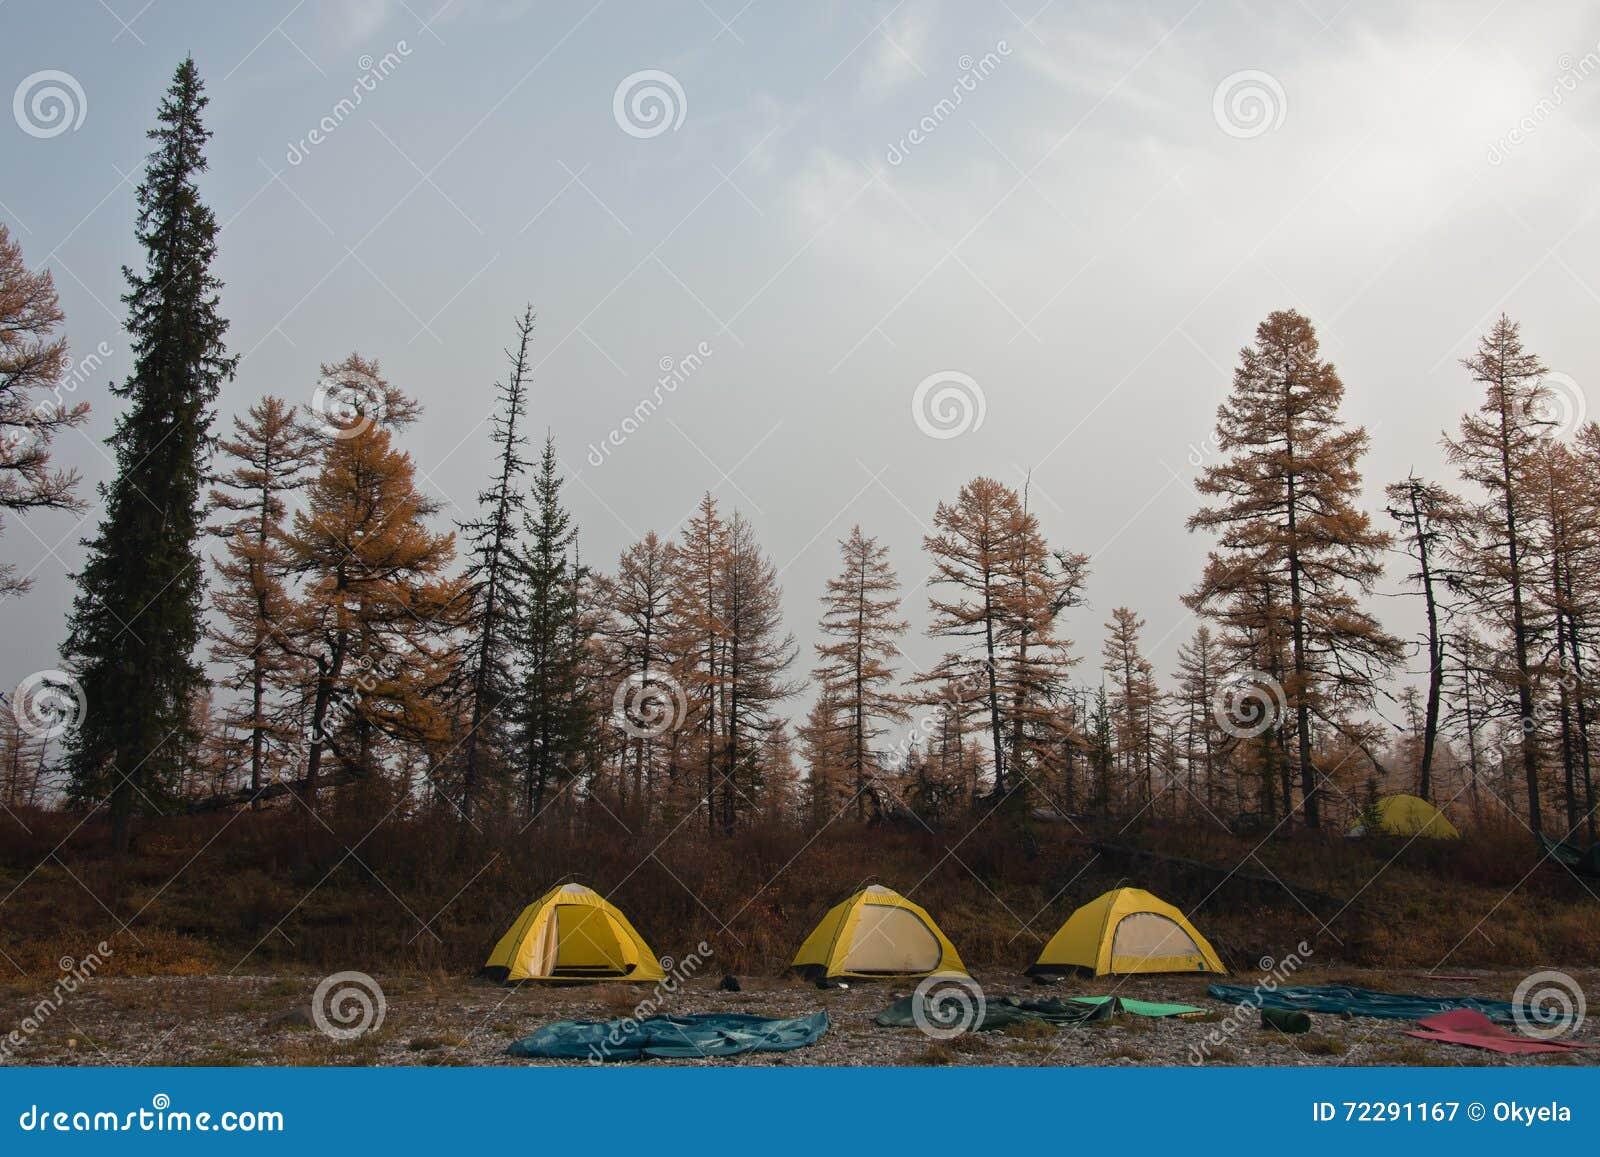 Download Желтый шатер на банках сибирских рек Taiga Стоковое Изображение - изображение насчитывающей automobiled, шатер: 72291167